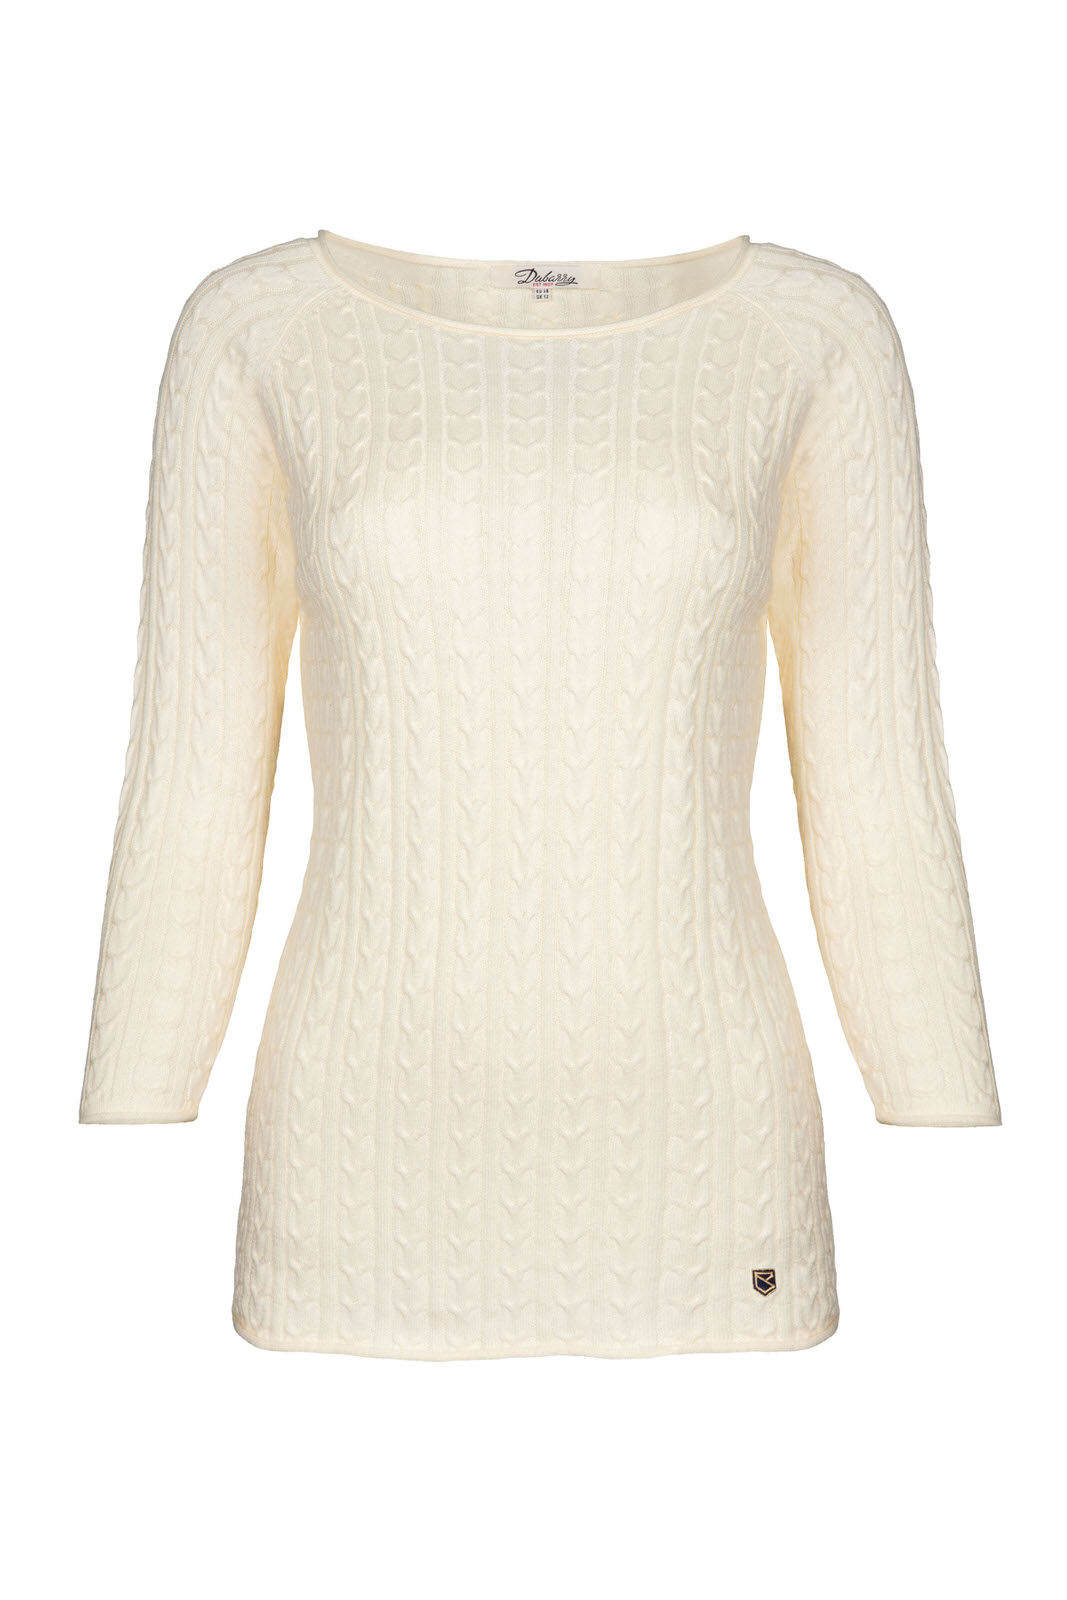 Dubarry_ Caltra Sweater - Sail White_Image_2